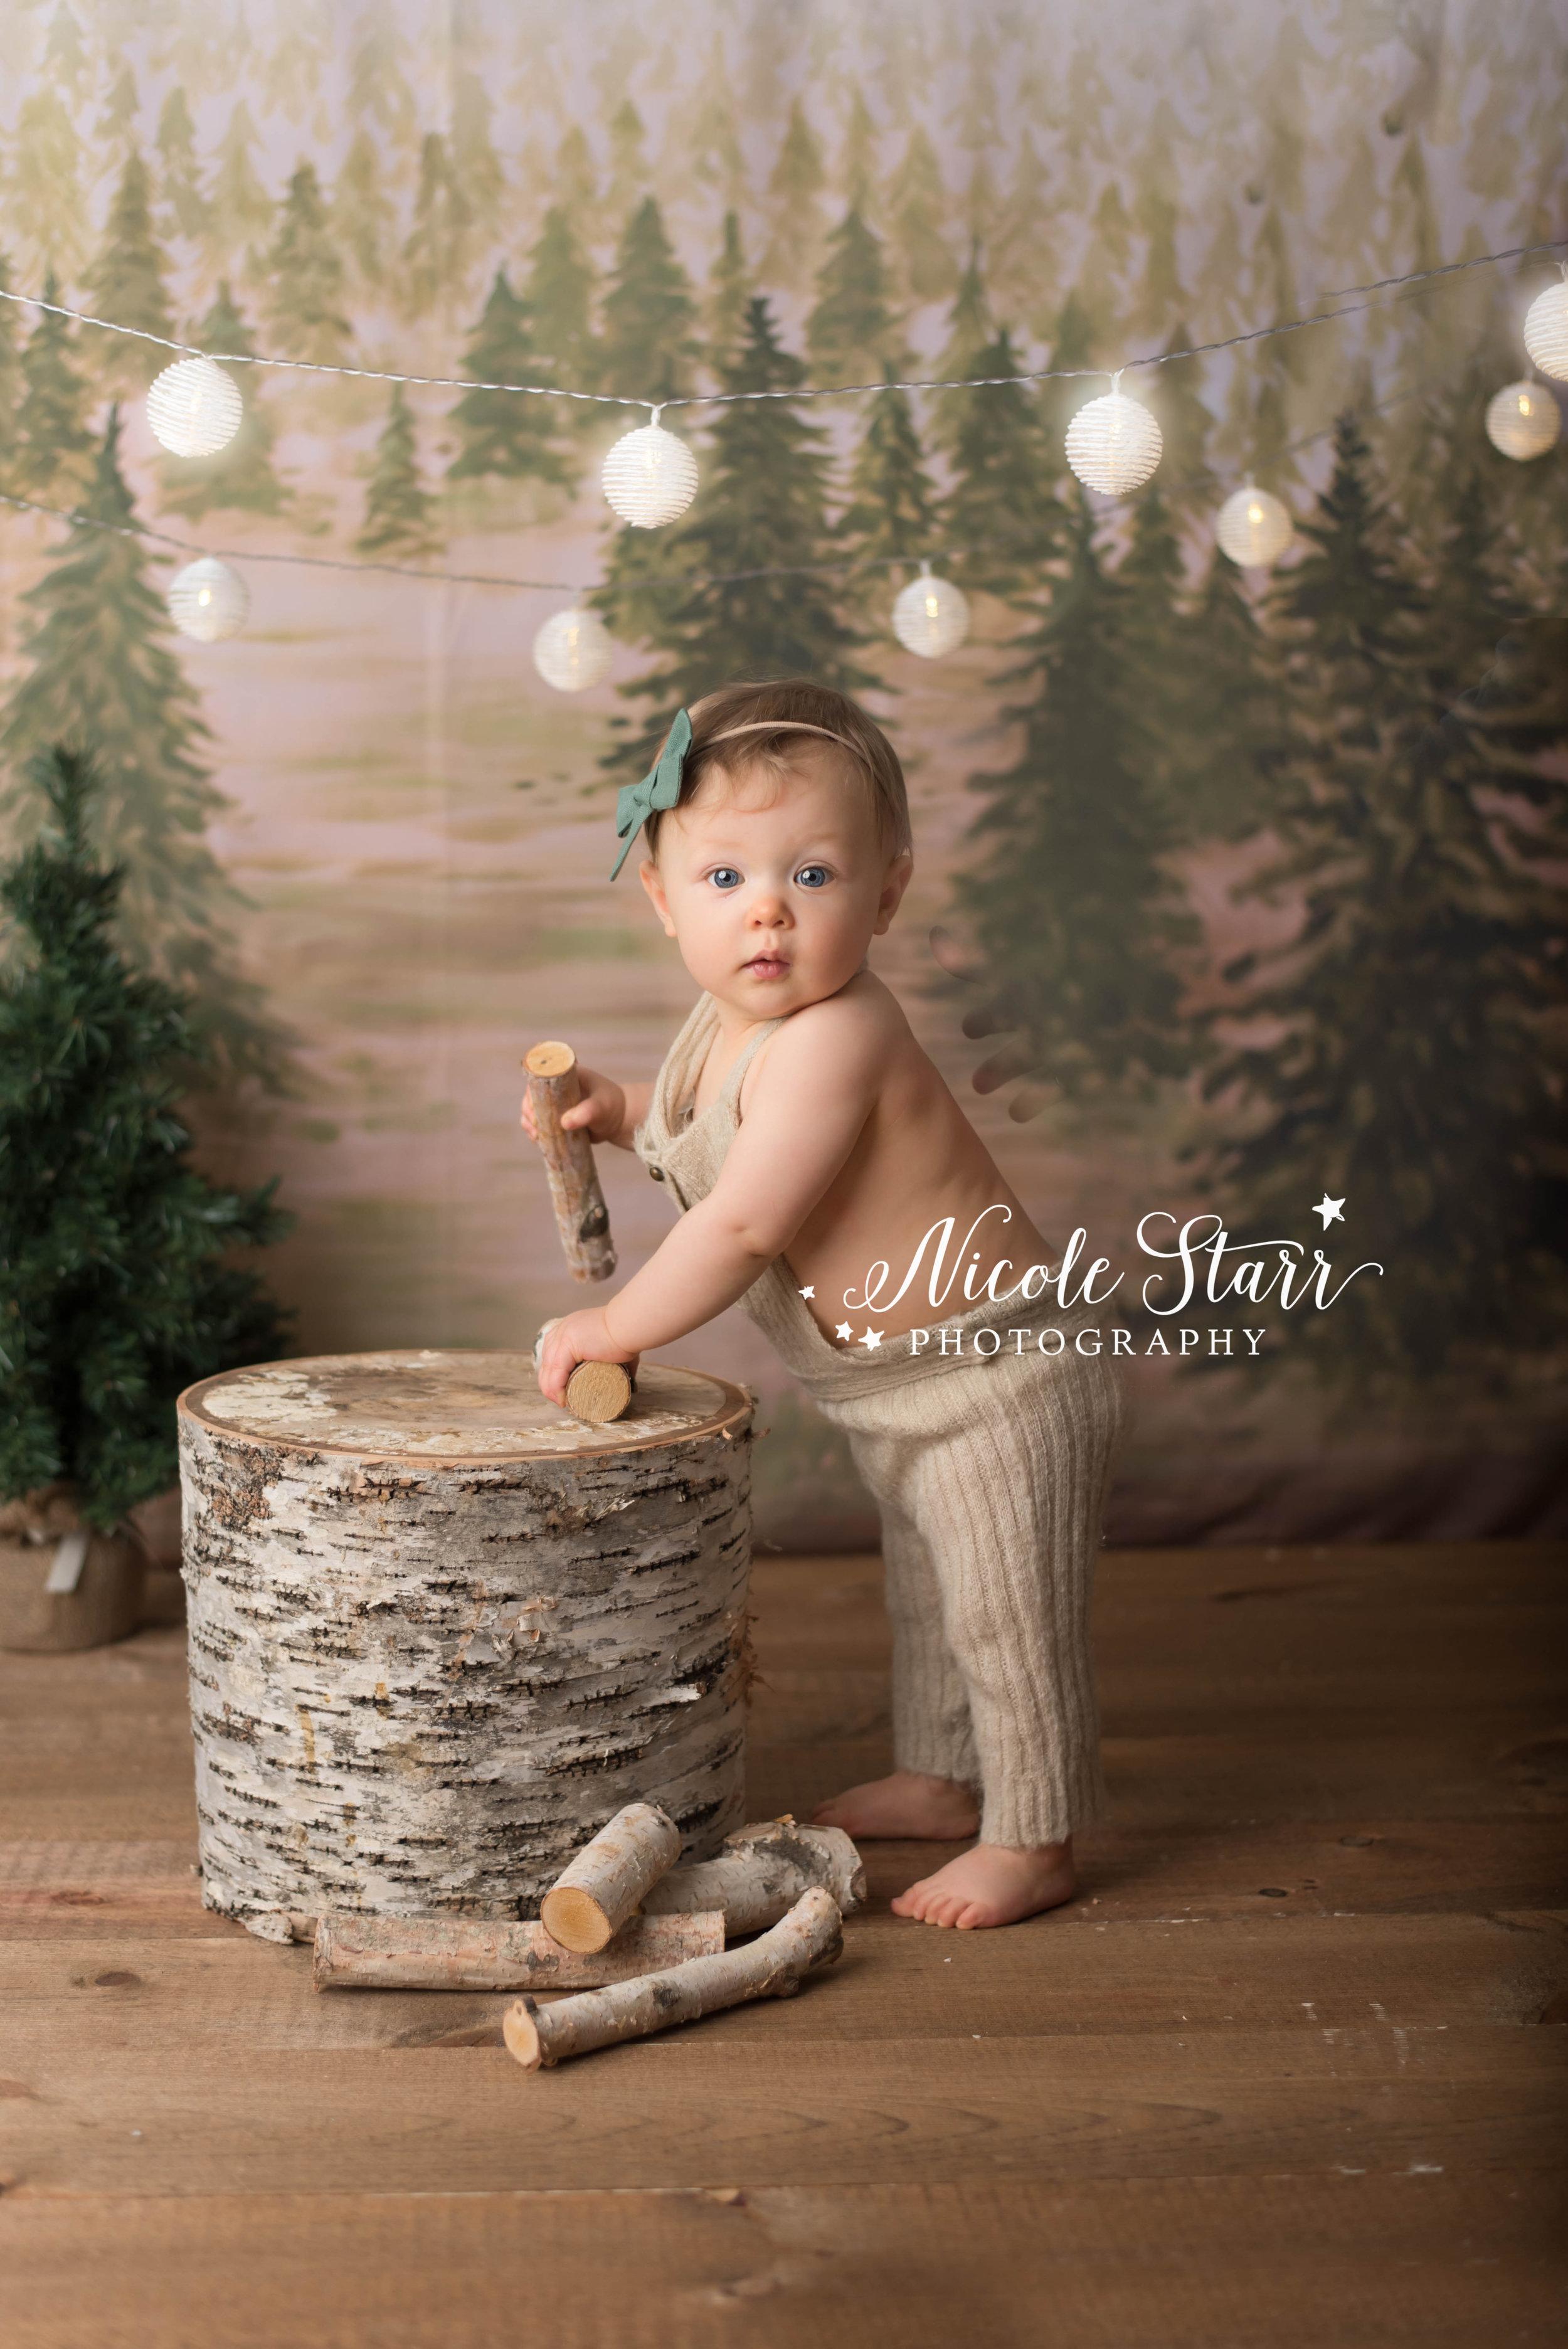 WM nicole starr photography-3.jpg